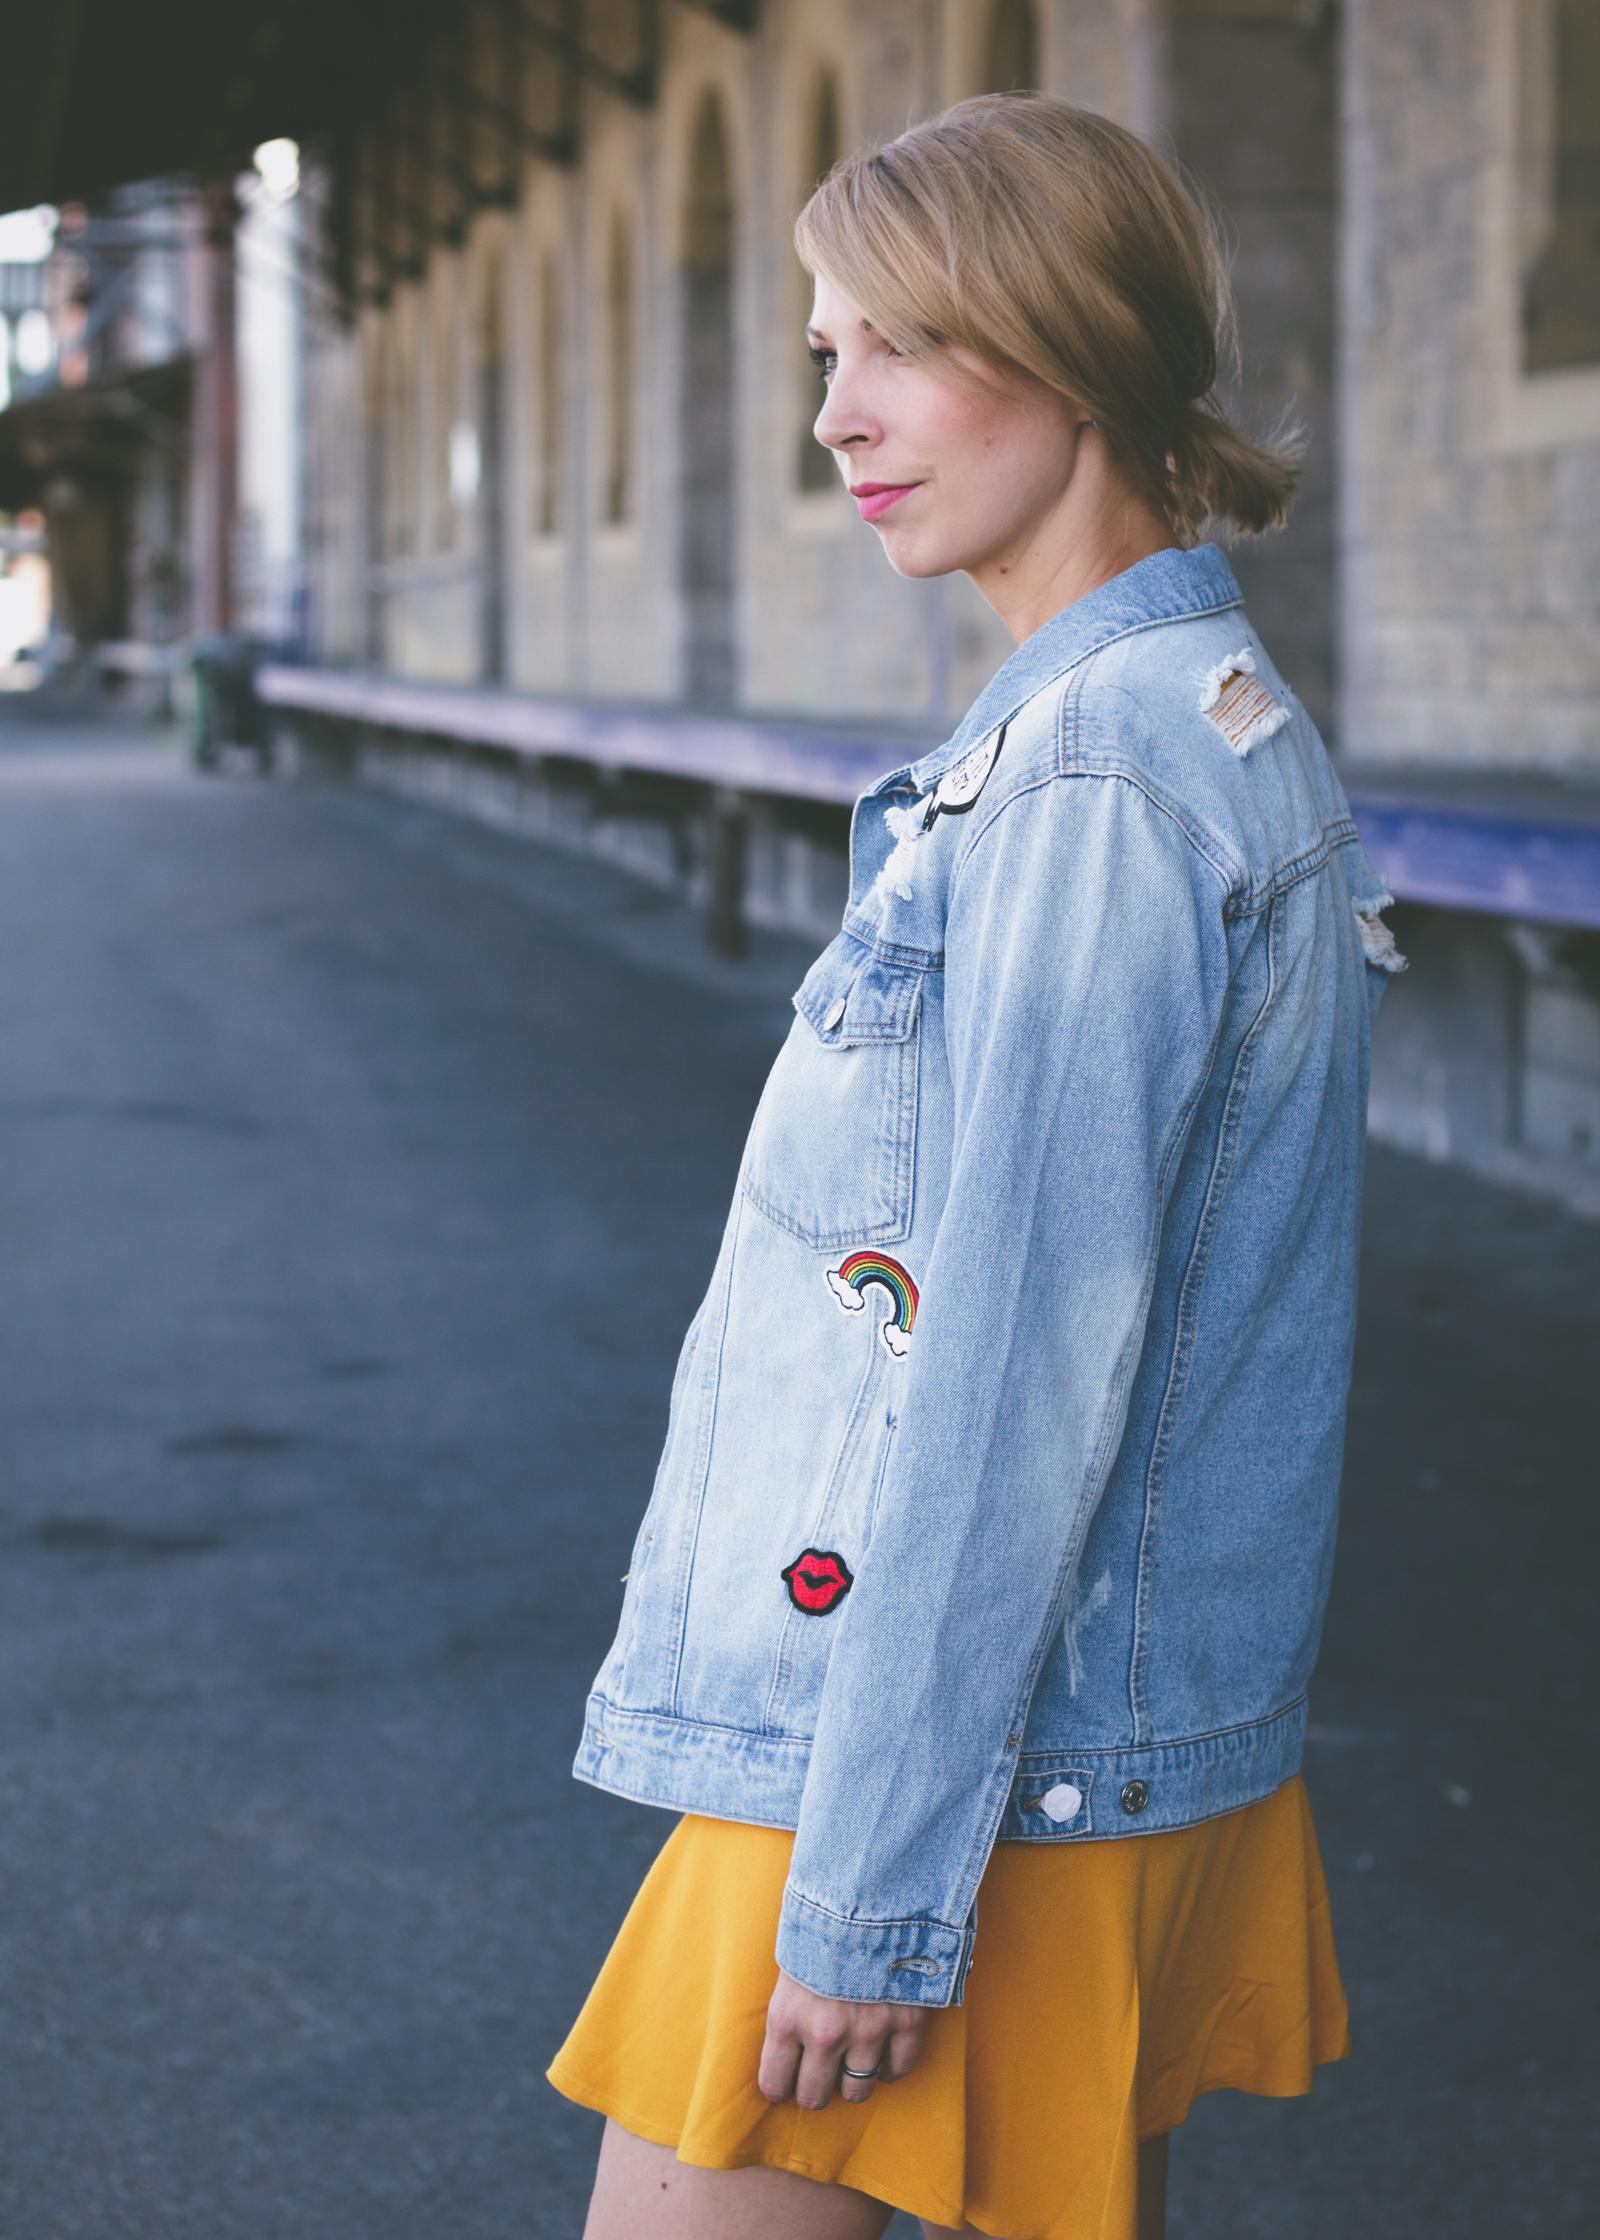 outfit kleid senfgelb jeansjacke mit patches puma basket. Black Bedroom Furniture Sets. Home Design Ideas